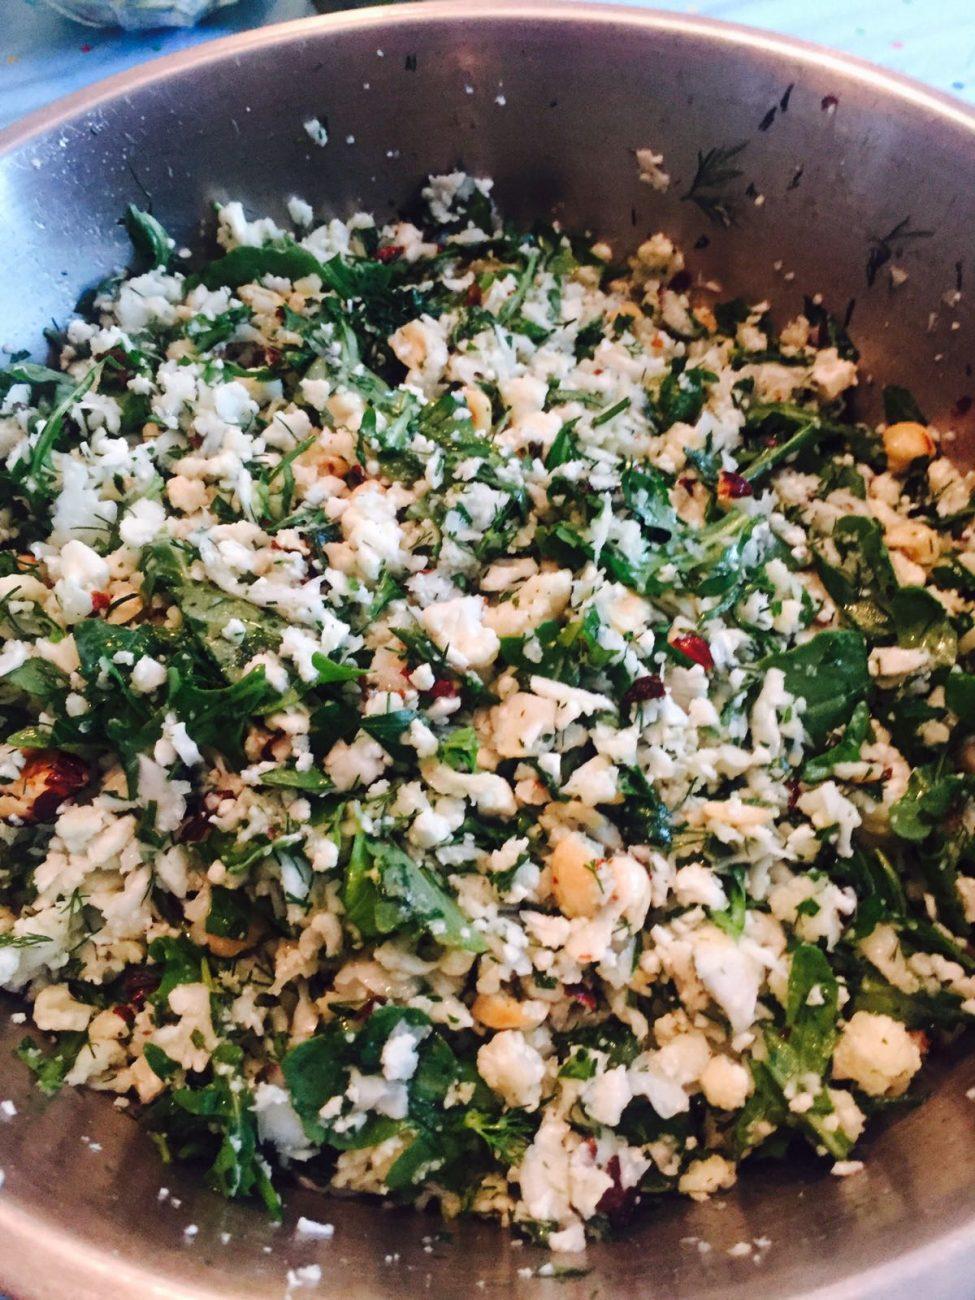 Cauliflower Salad With Herbs and Hazelnut